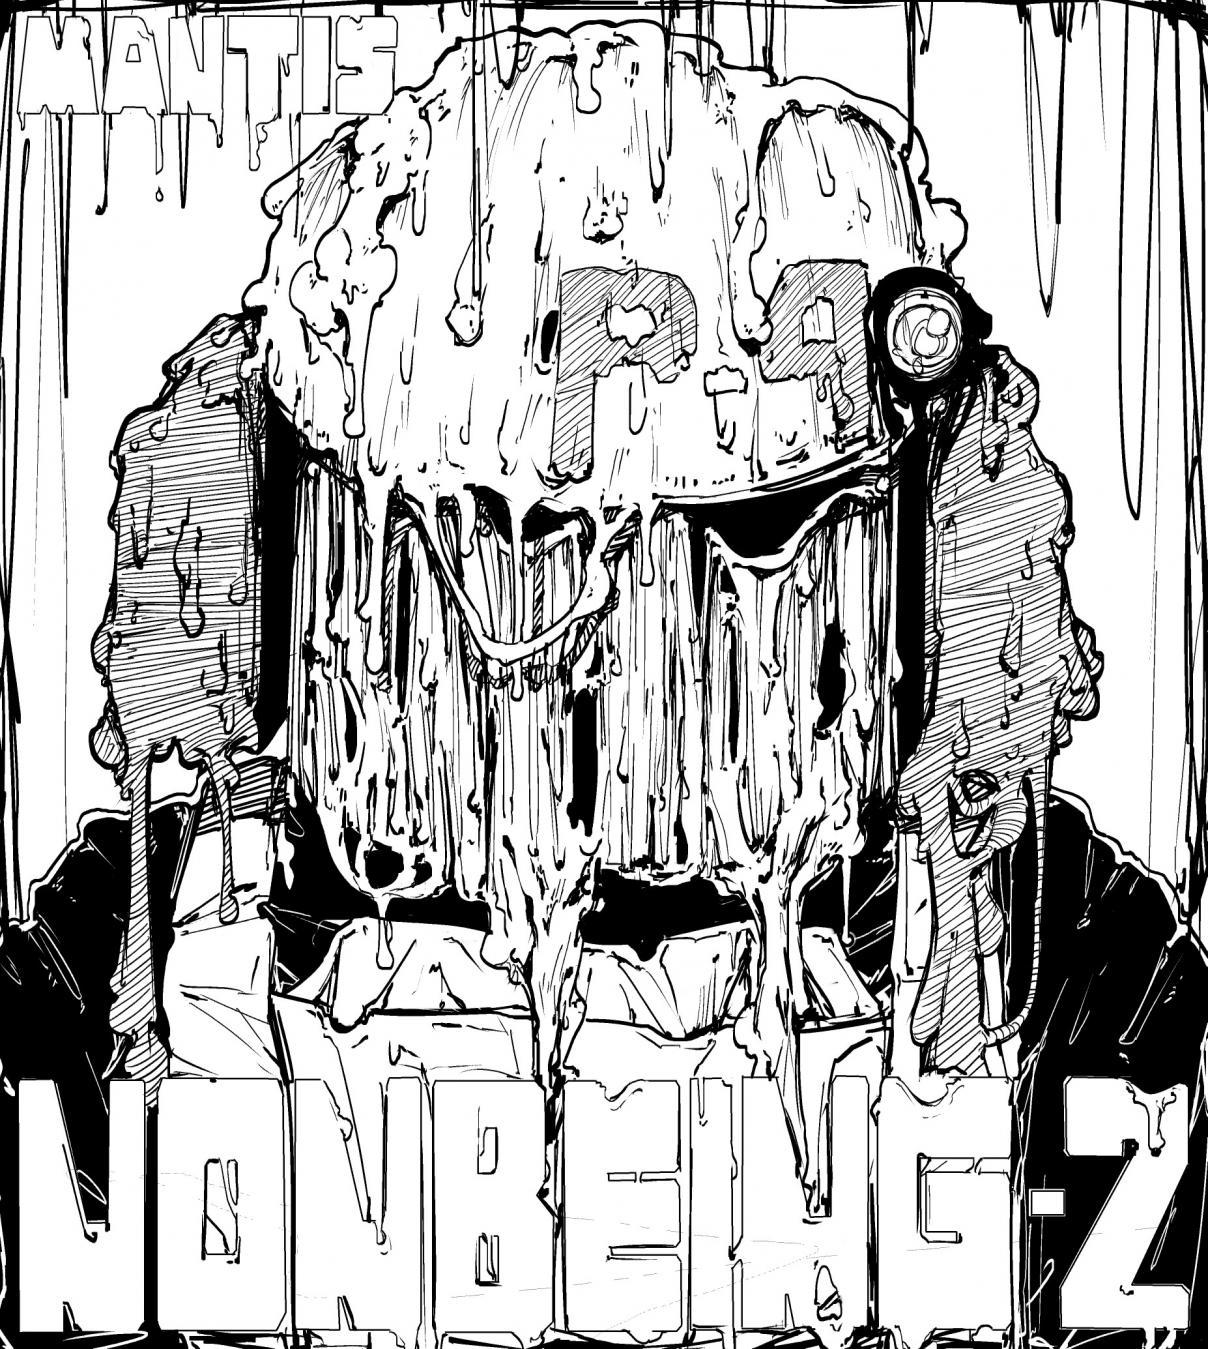 https://img3.nineanime.com/comics/pic4/51/47731/2911873/5309fd5b3d244d1bf1dfe116e5c49063.jpg Page 1